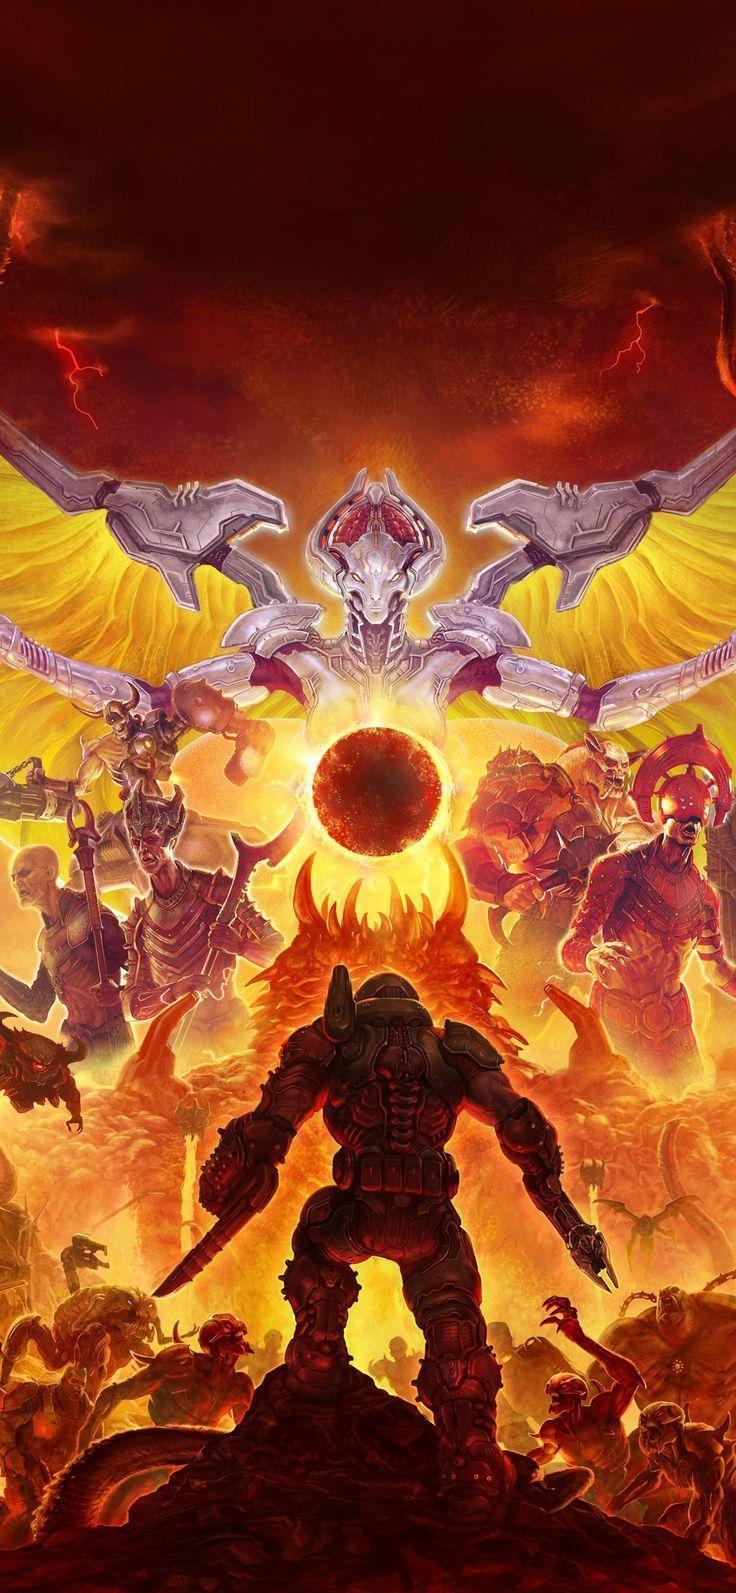 1252436 Game Warriors Doom Eternal 2019 Wallpaper 4k Doom Game Doom Videogame Gaming Wallpapers